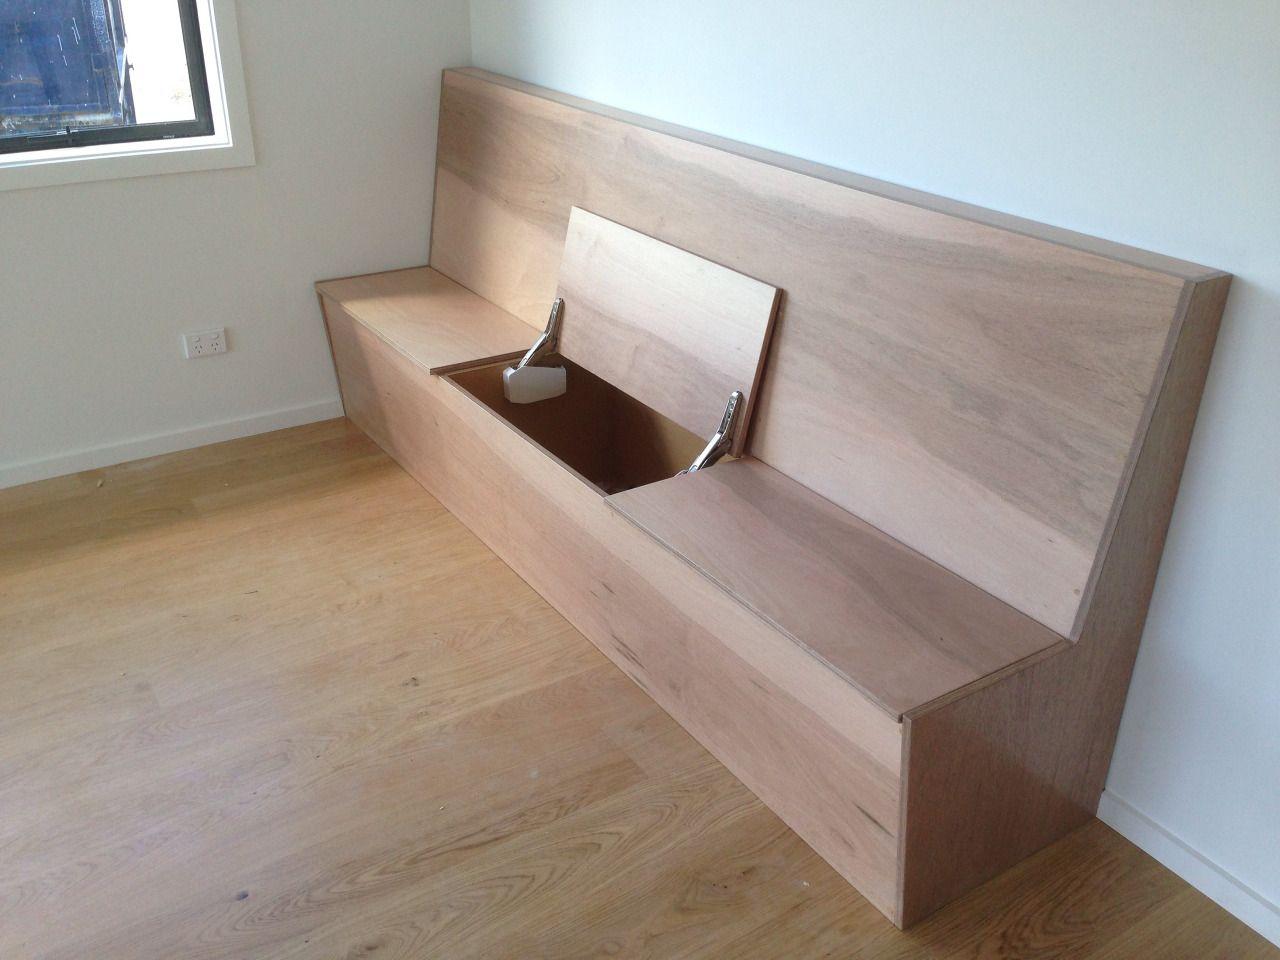 bench seat with storage | Storage bench seating, Storage ...